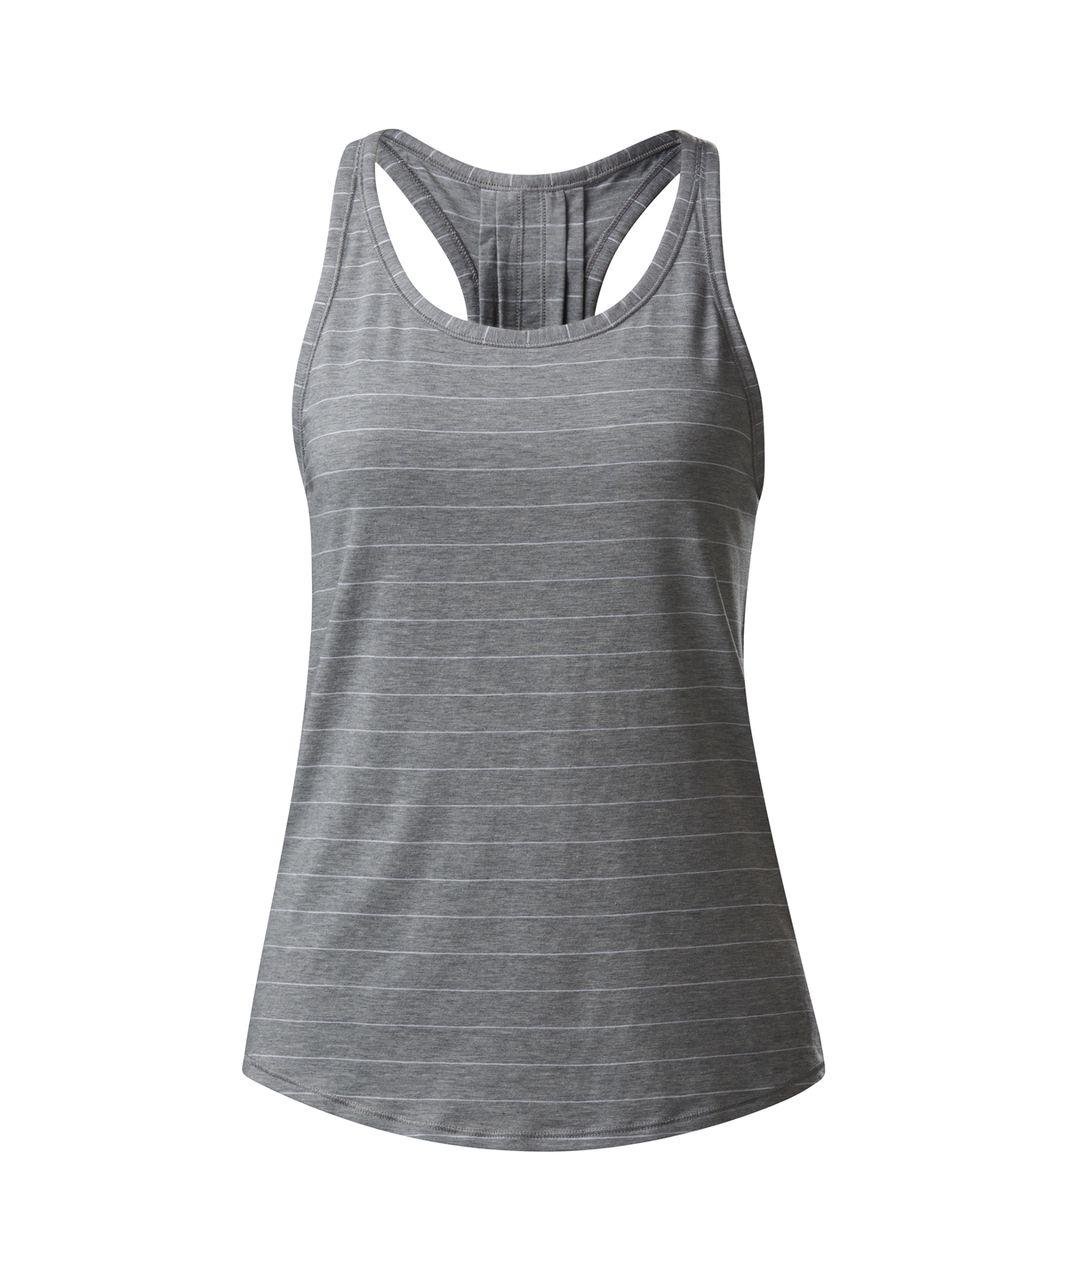 Lululemon Yogi Everyday Tank - Short Serve Stripe Heathered Medium Grey White